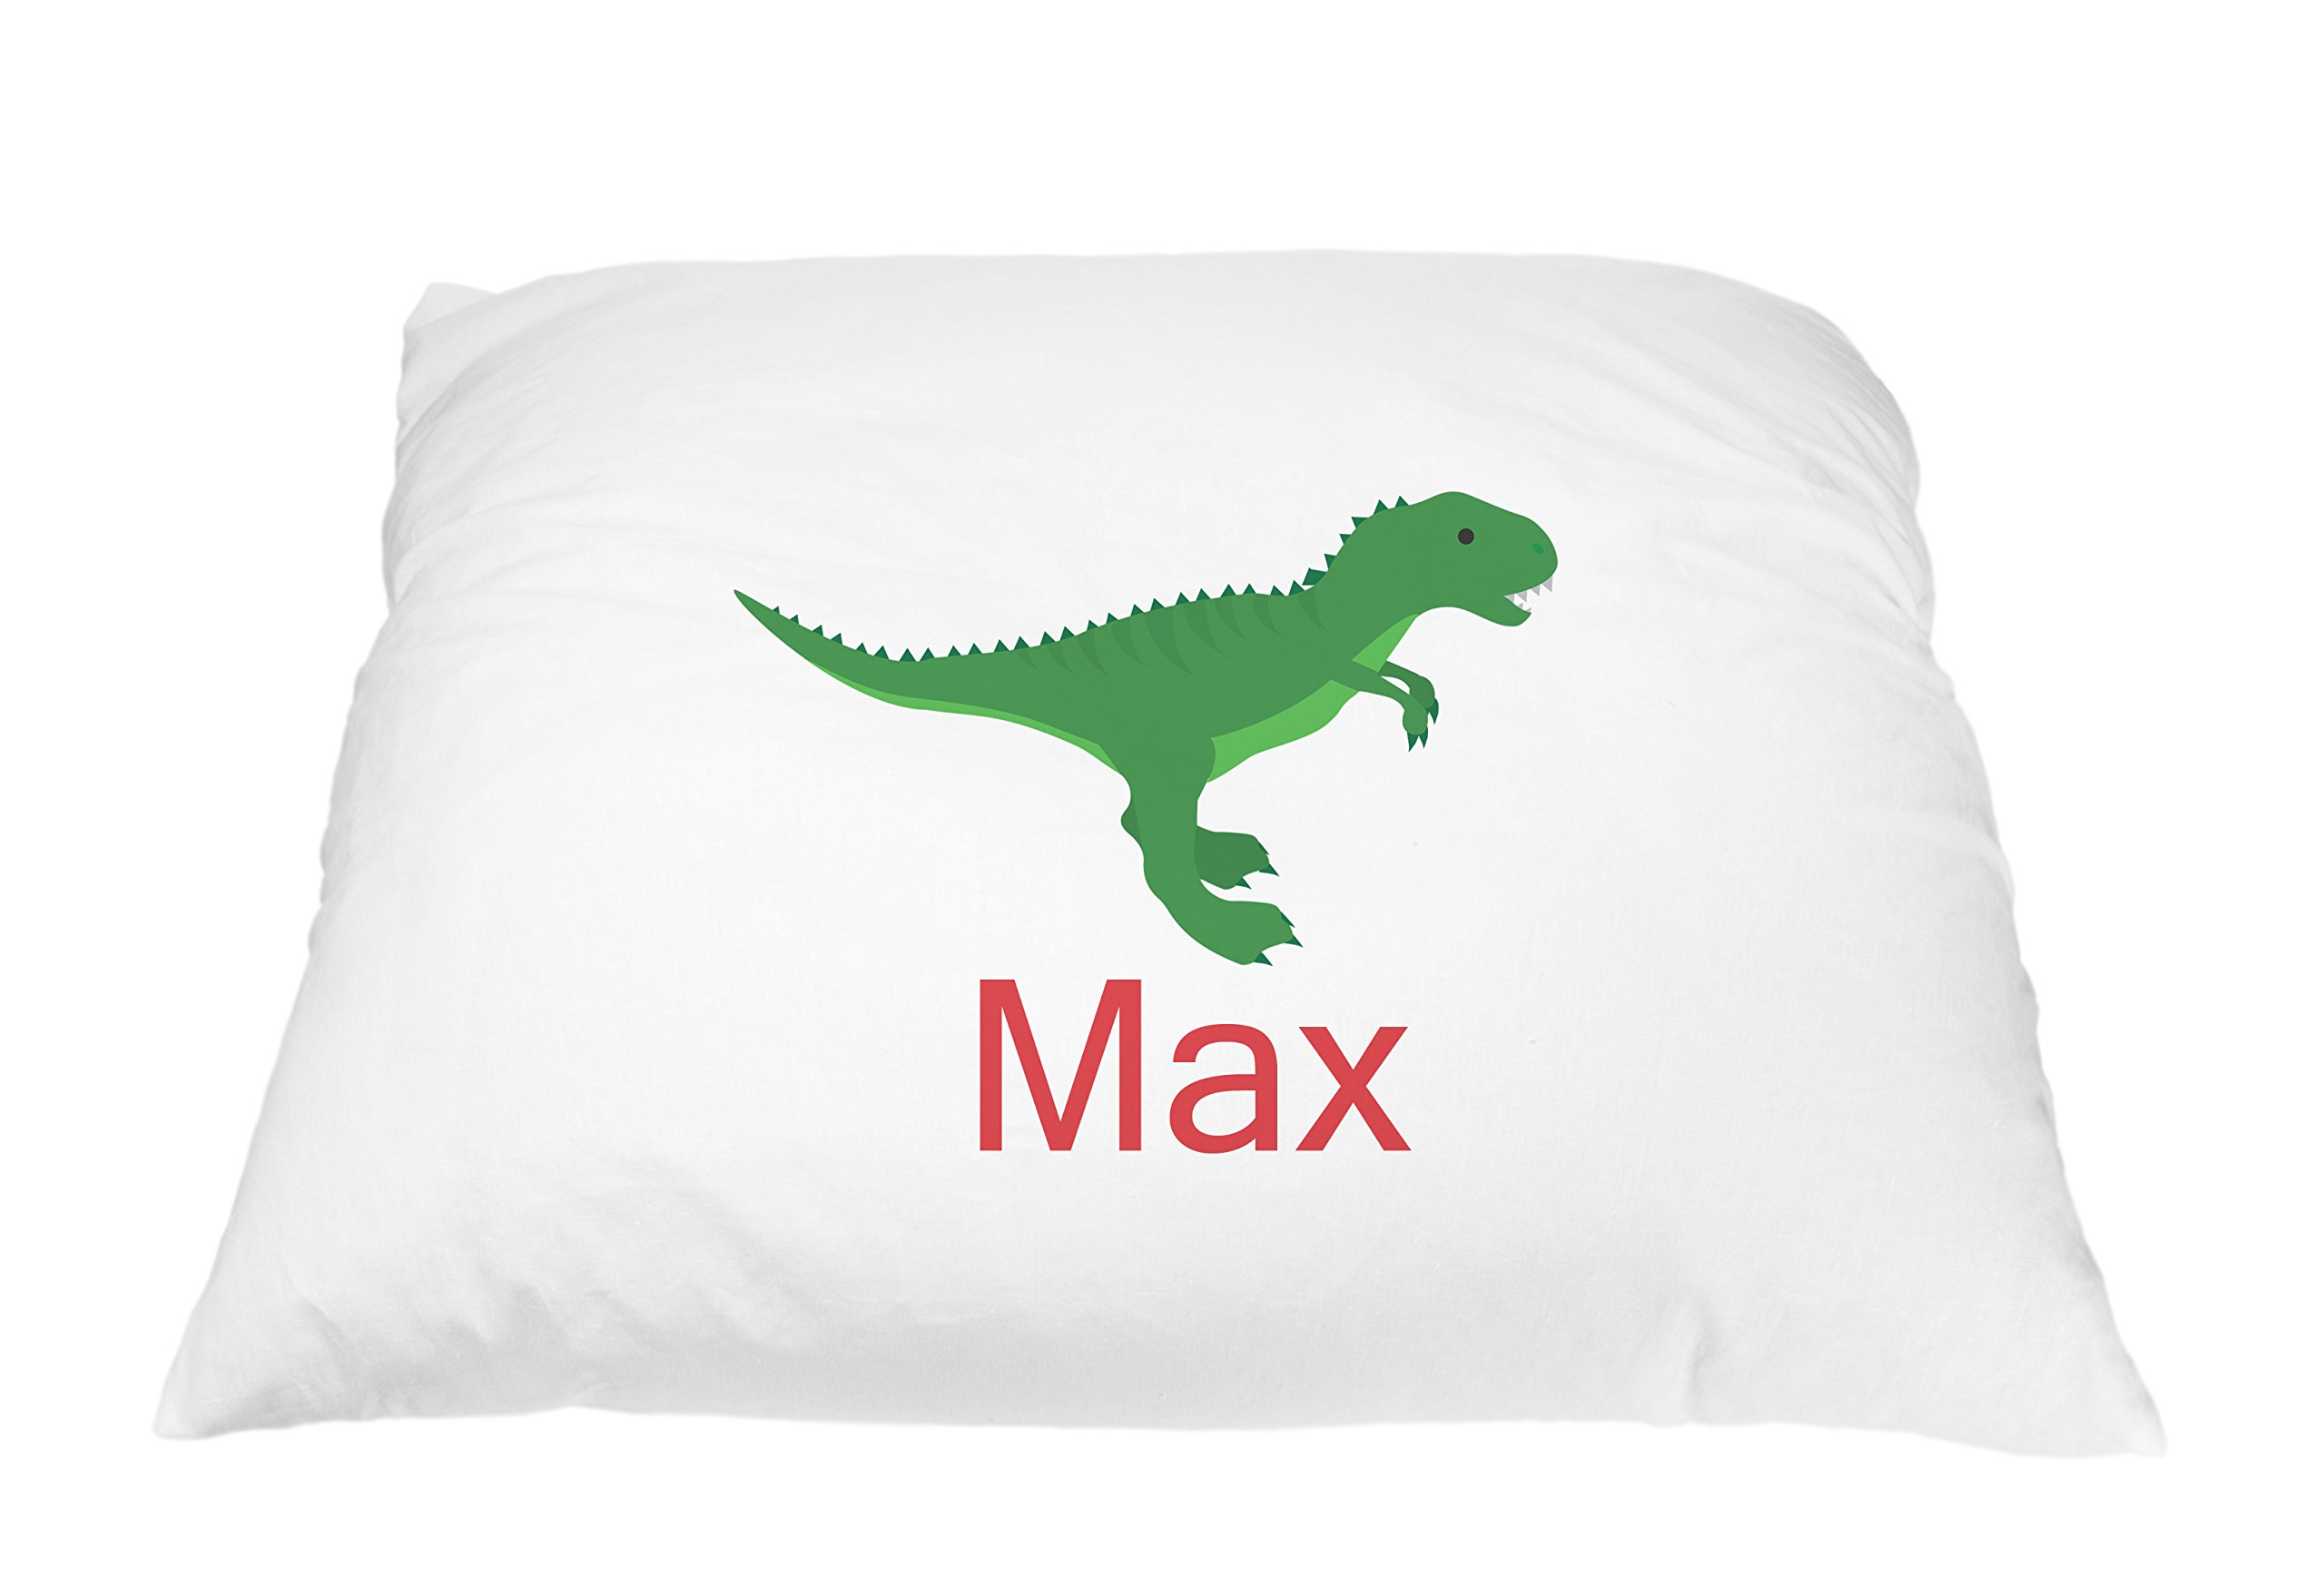 Personalized Kid's Dinosaur Pillowcase Microfiber Polyester Standard 20 by 30 Inches, Dinosaur Pillow Cover, Toddler Pillow Cover, Dino & T Rex Pillow for Dinosaur Kids Room